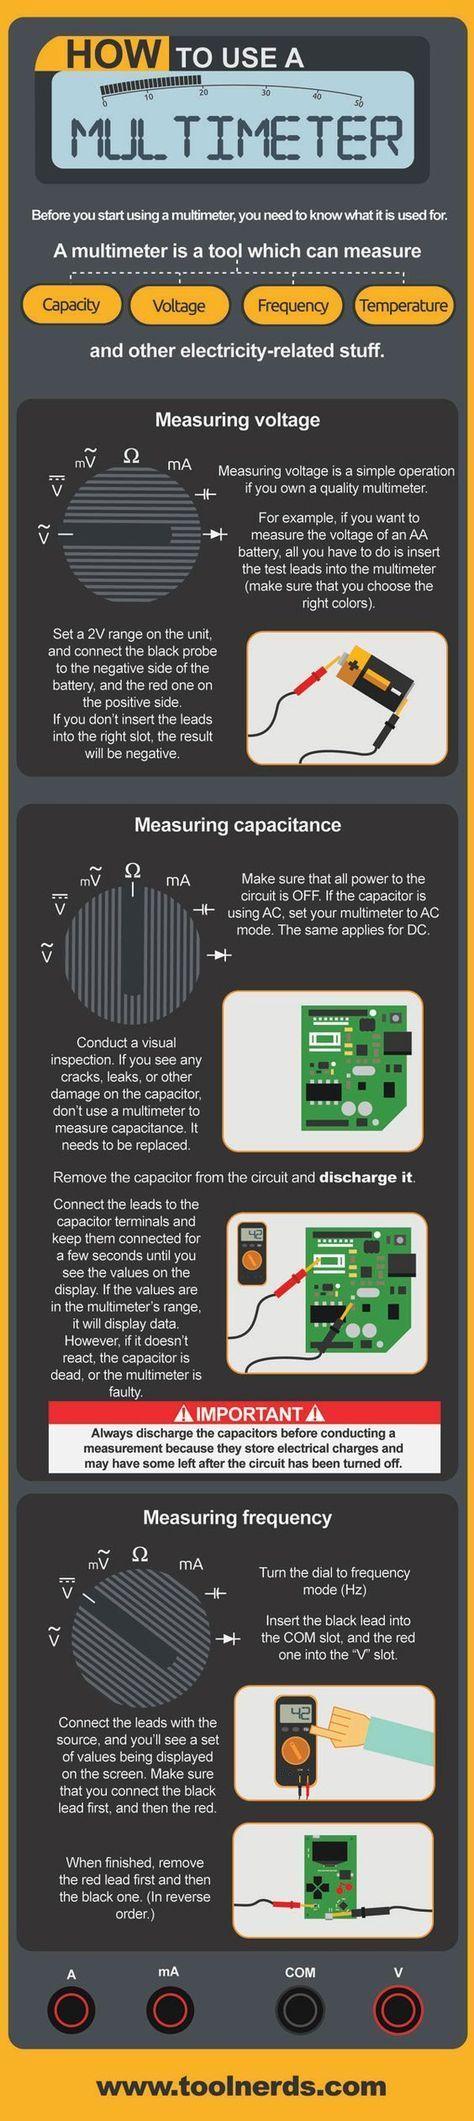 Basic Electrical Wiring Read Wiring Diagram Symbols Terminal Codes